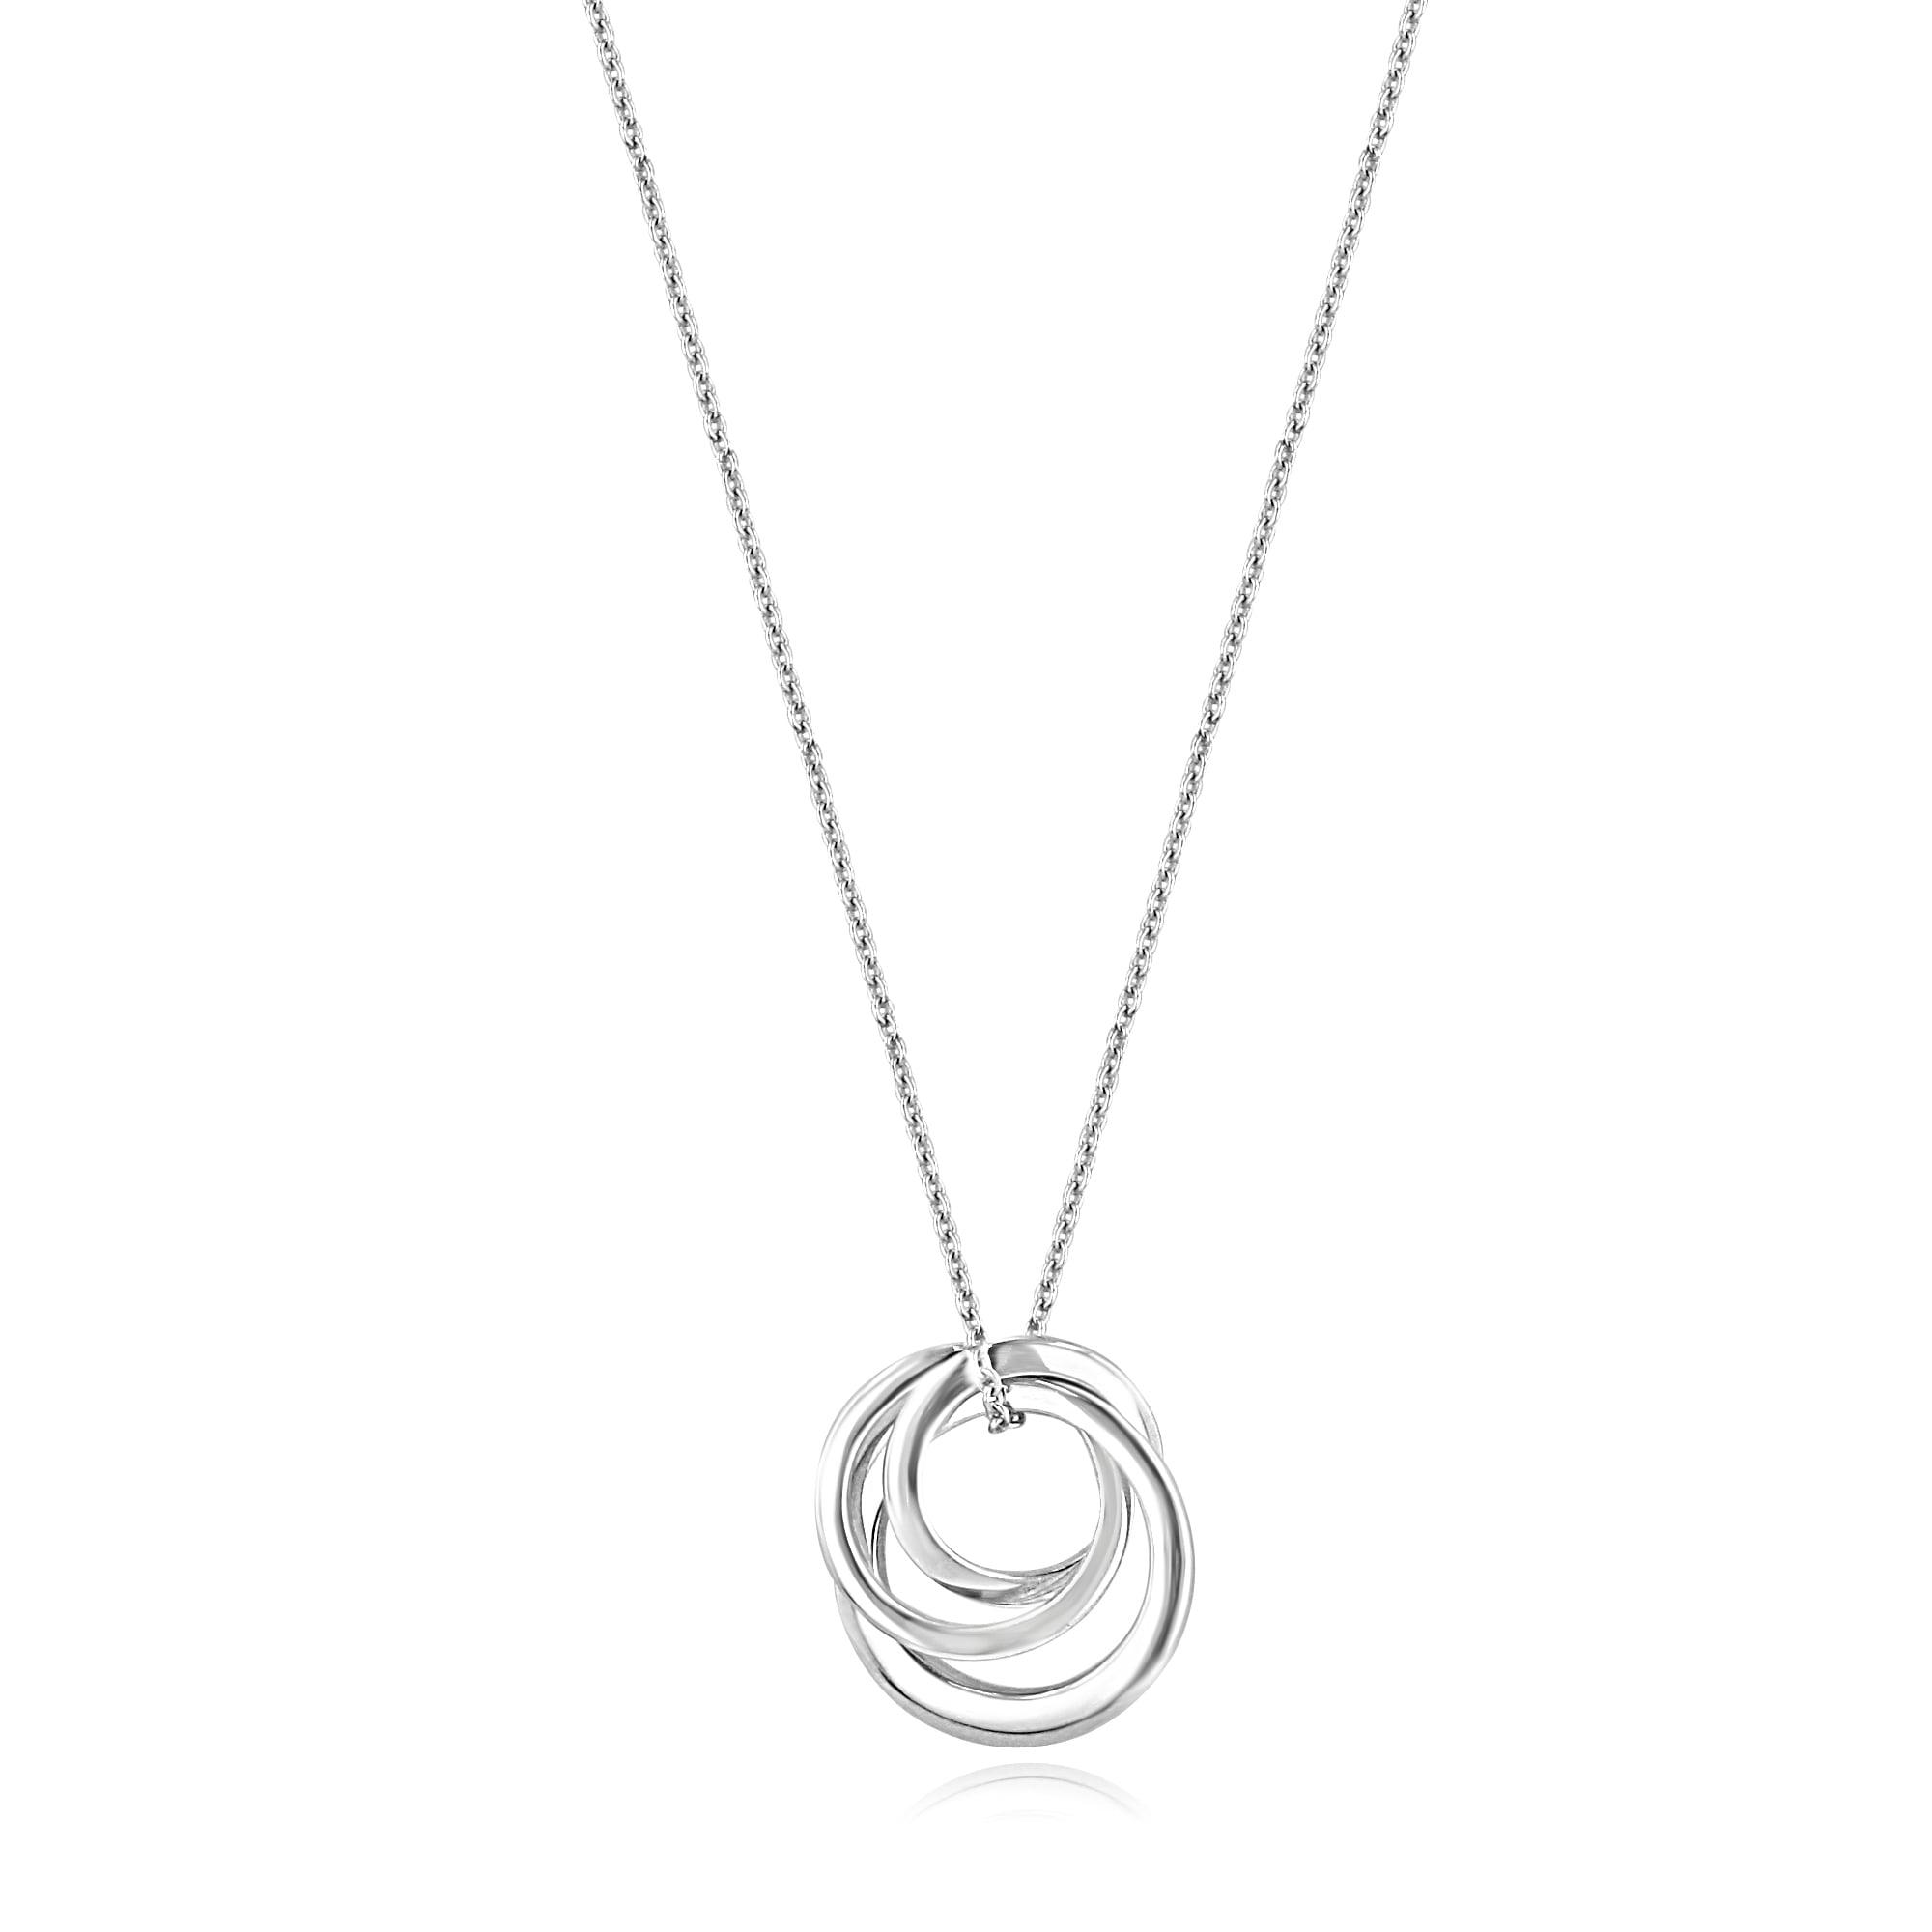 45eacb3fc Avanti 9ct White Gold Triple Interlocking Ring Pendant and Trace Chain